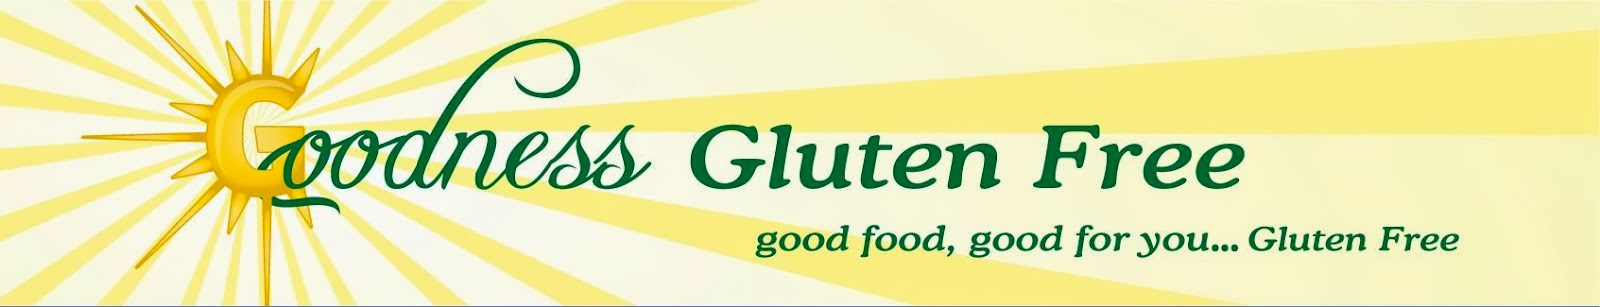 Goodness Gluten Free